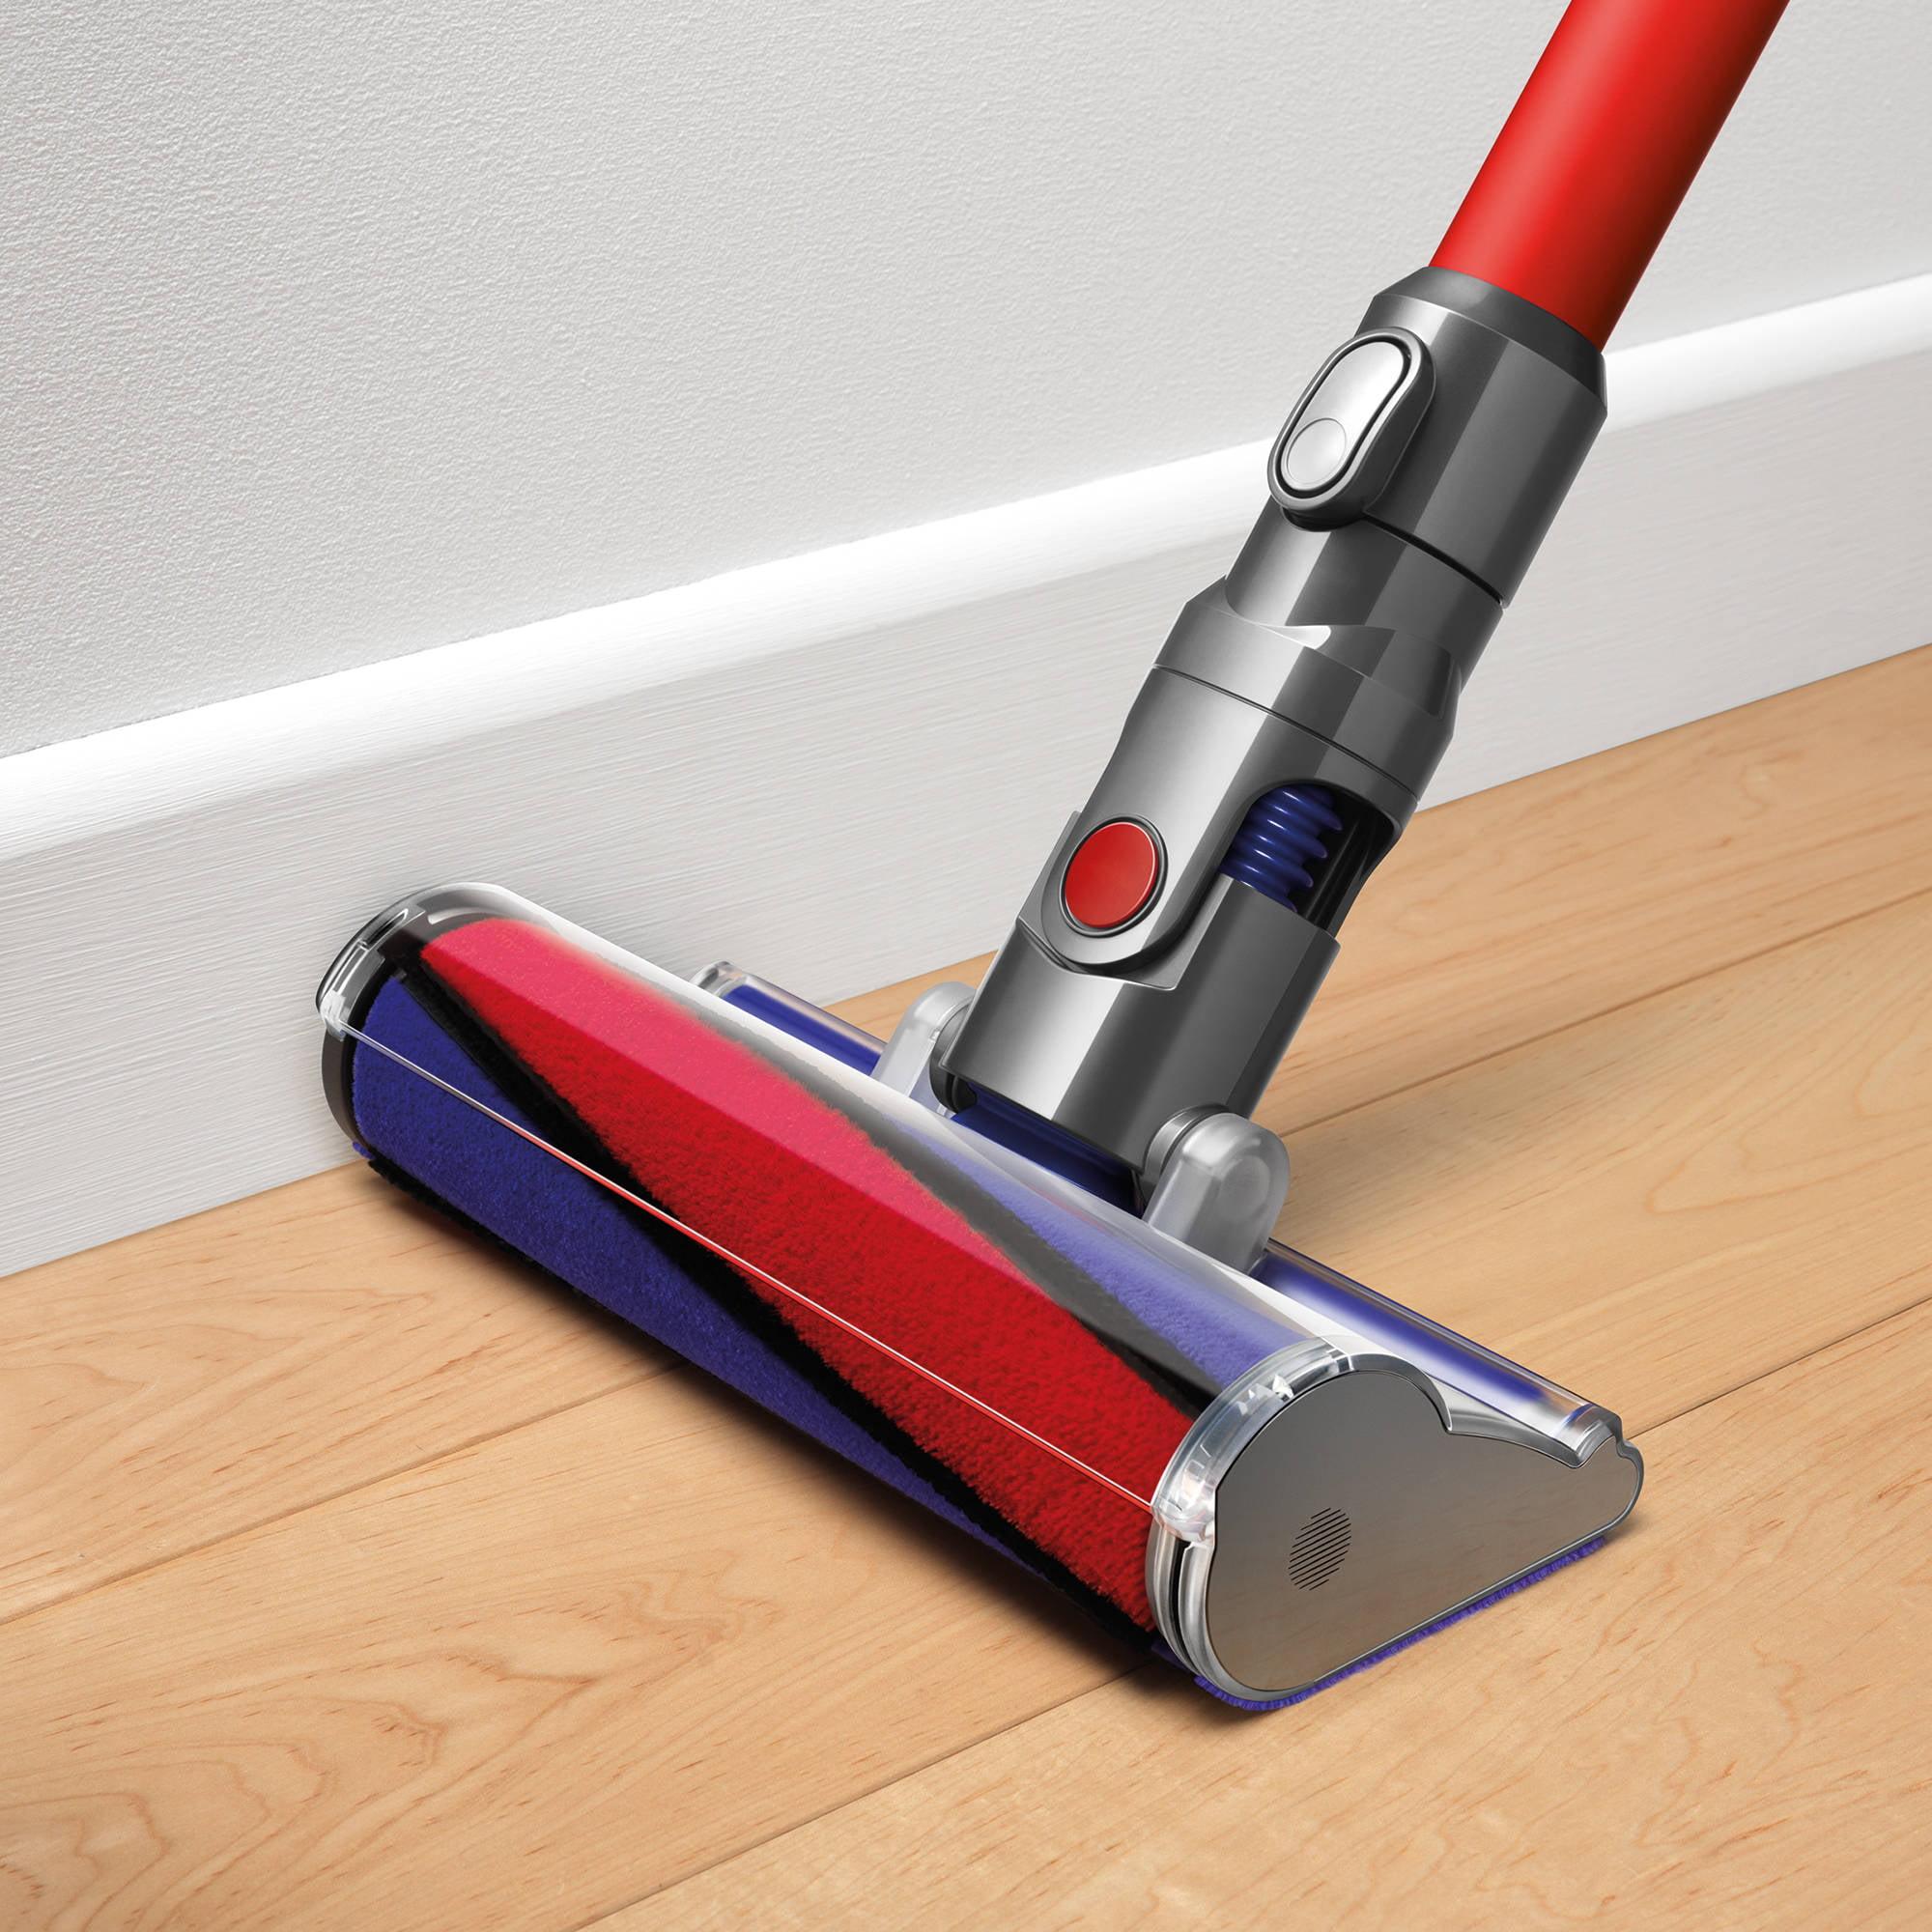 Dyson Hardwood Floor dyson dc39 multi floor 2017 hardwood floor vacuums Dyson V6 Absolute 209560 01 Walmartcom